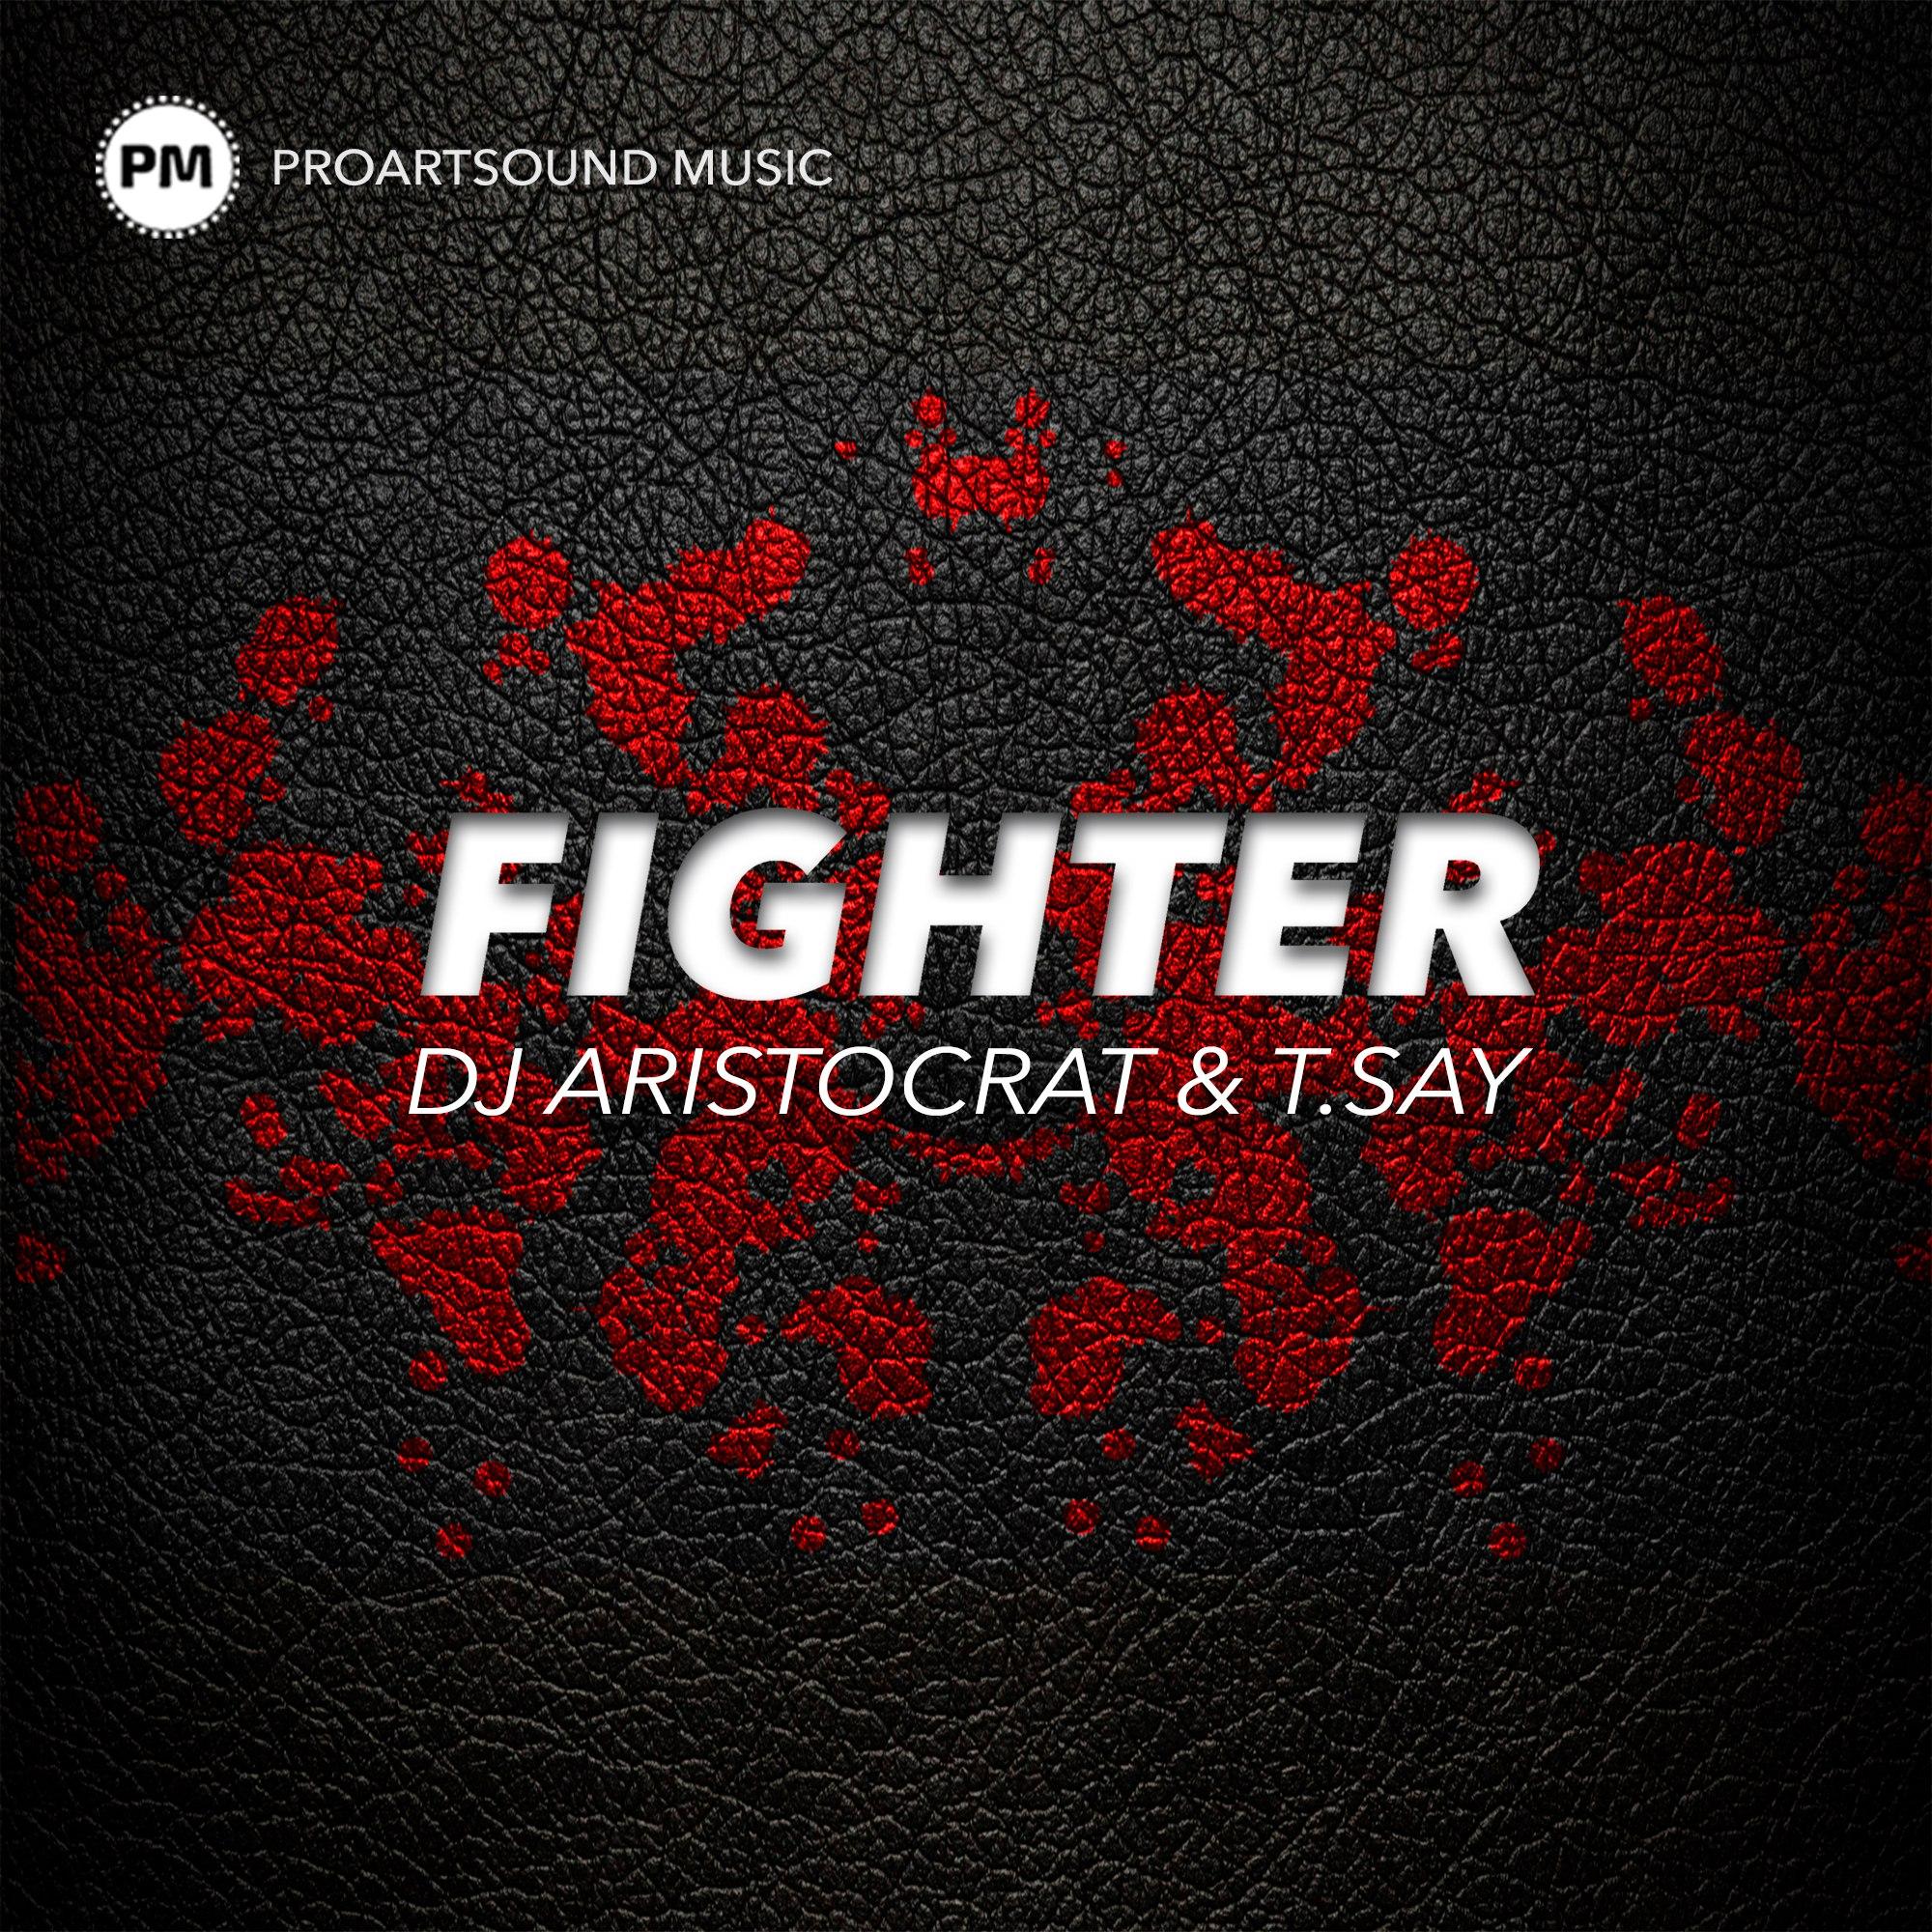 DJ Aristocrat & T.Say - Fighter